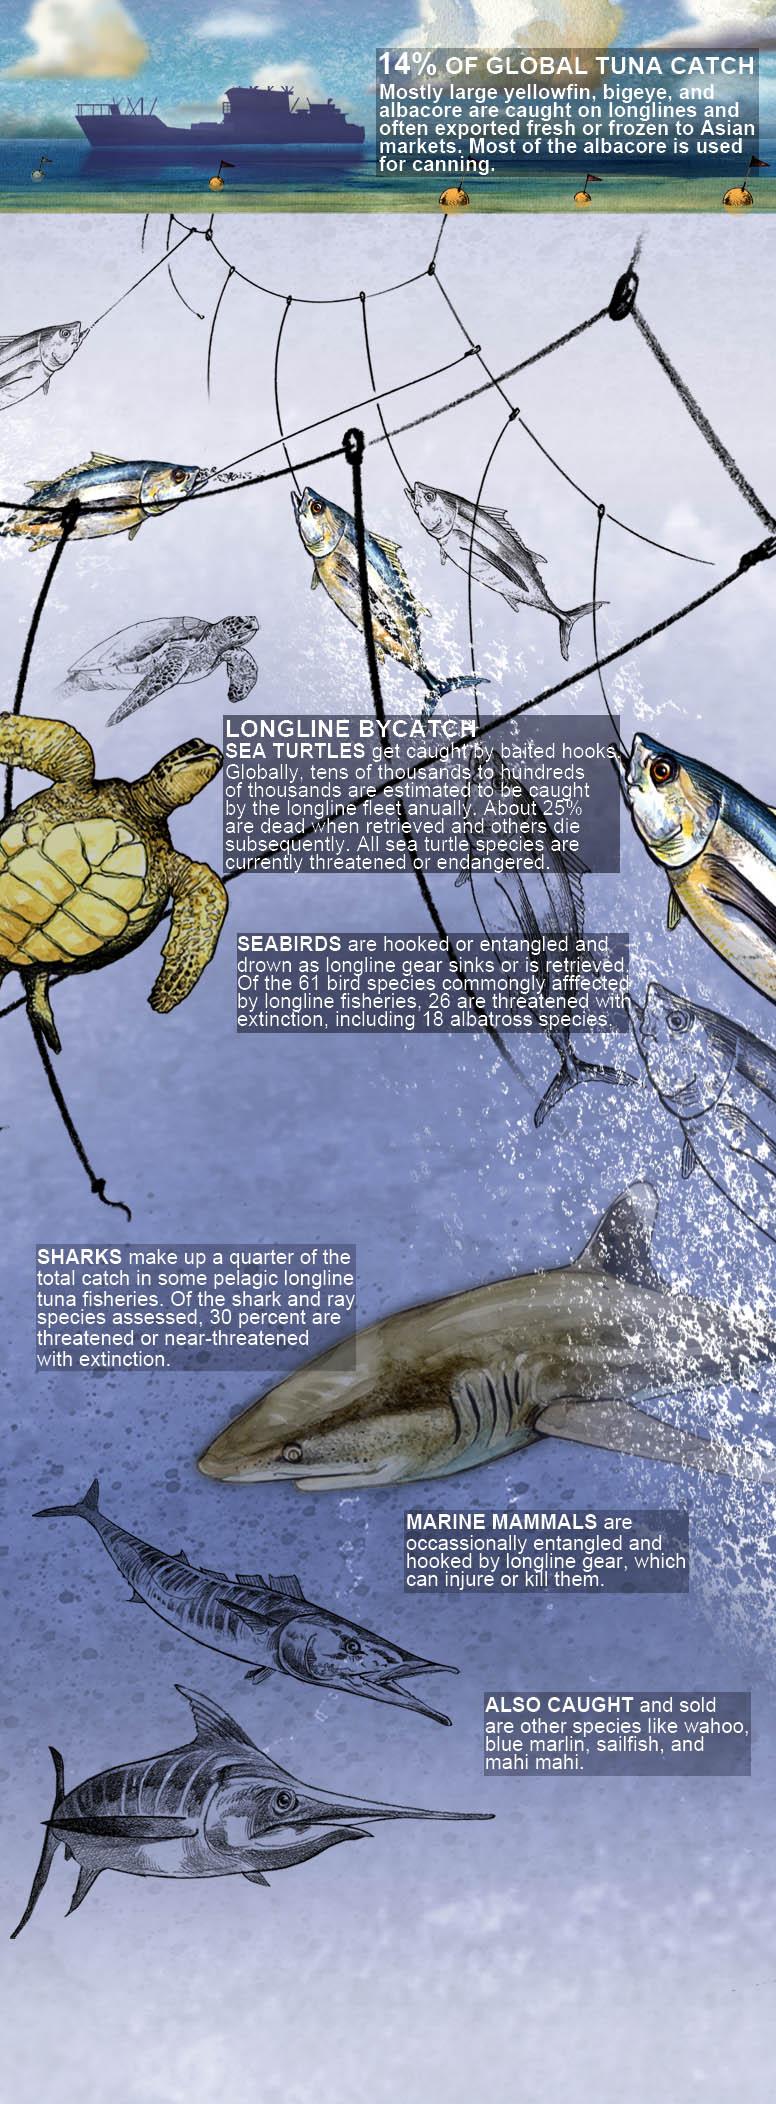 Global Tuna Fishing | The Pew Charitable Trusts